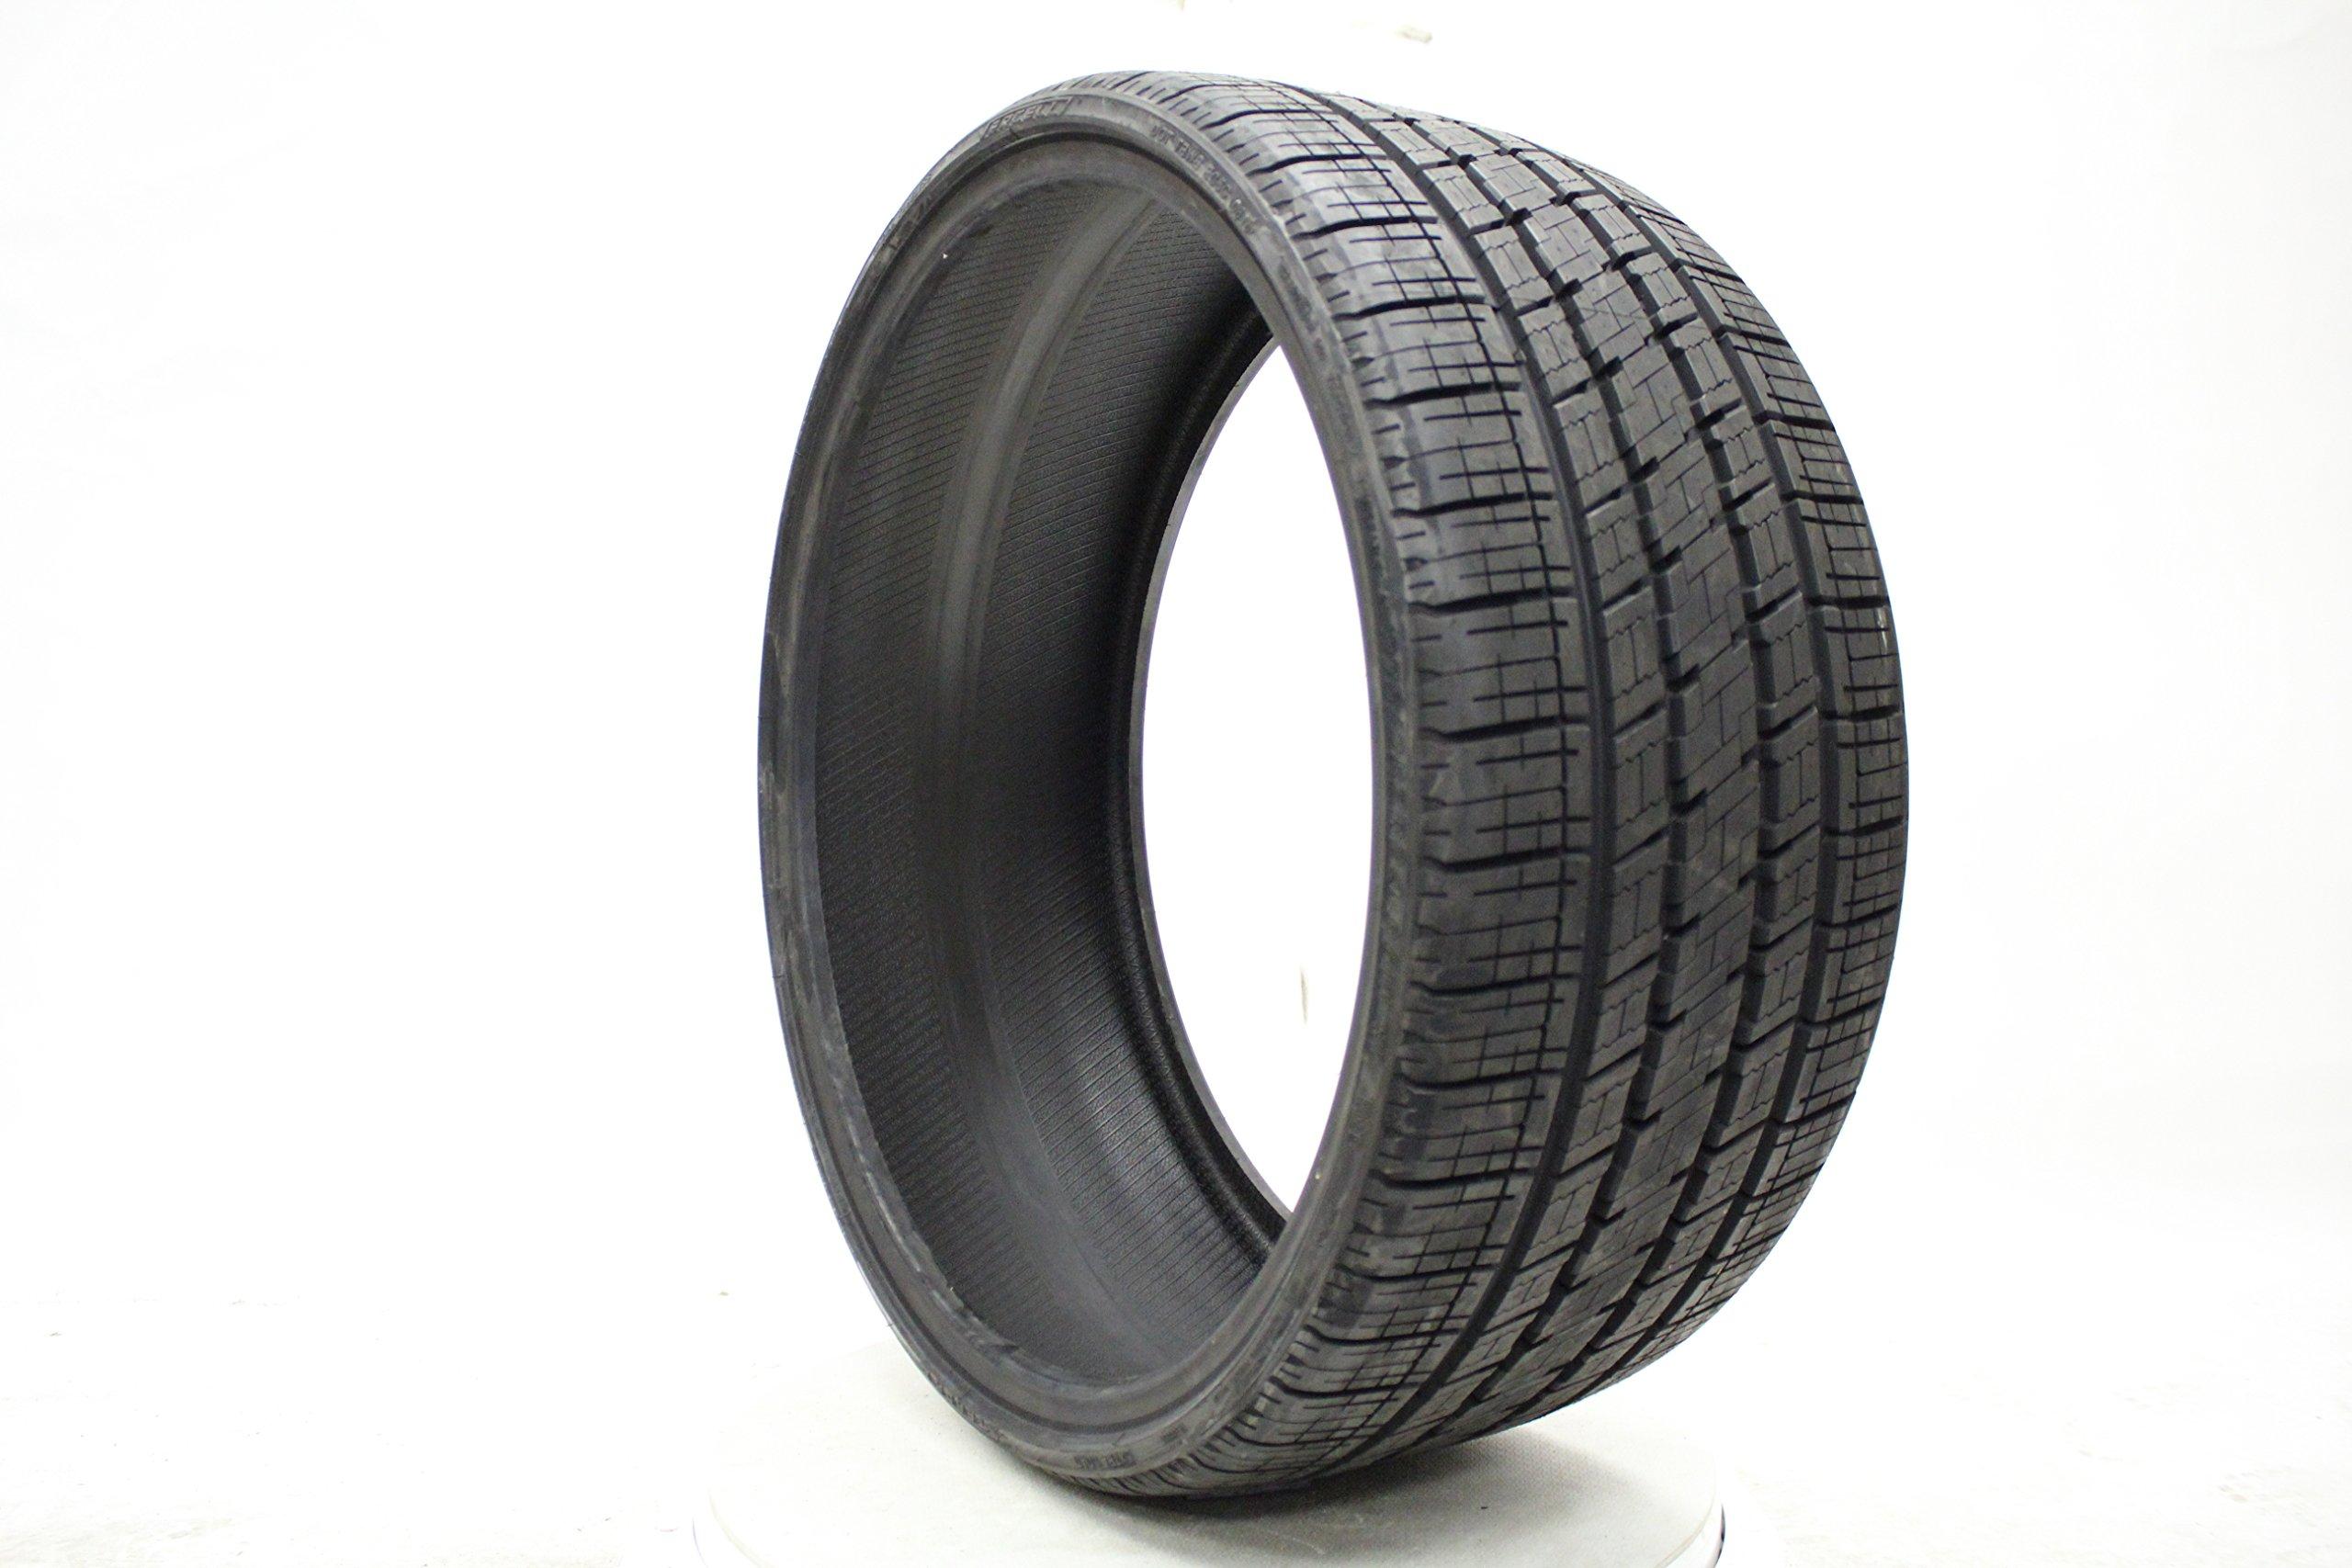 Vercelli Strada IV All-Season Radial Tire - 265/35R22 102V